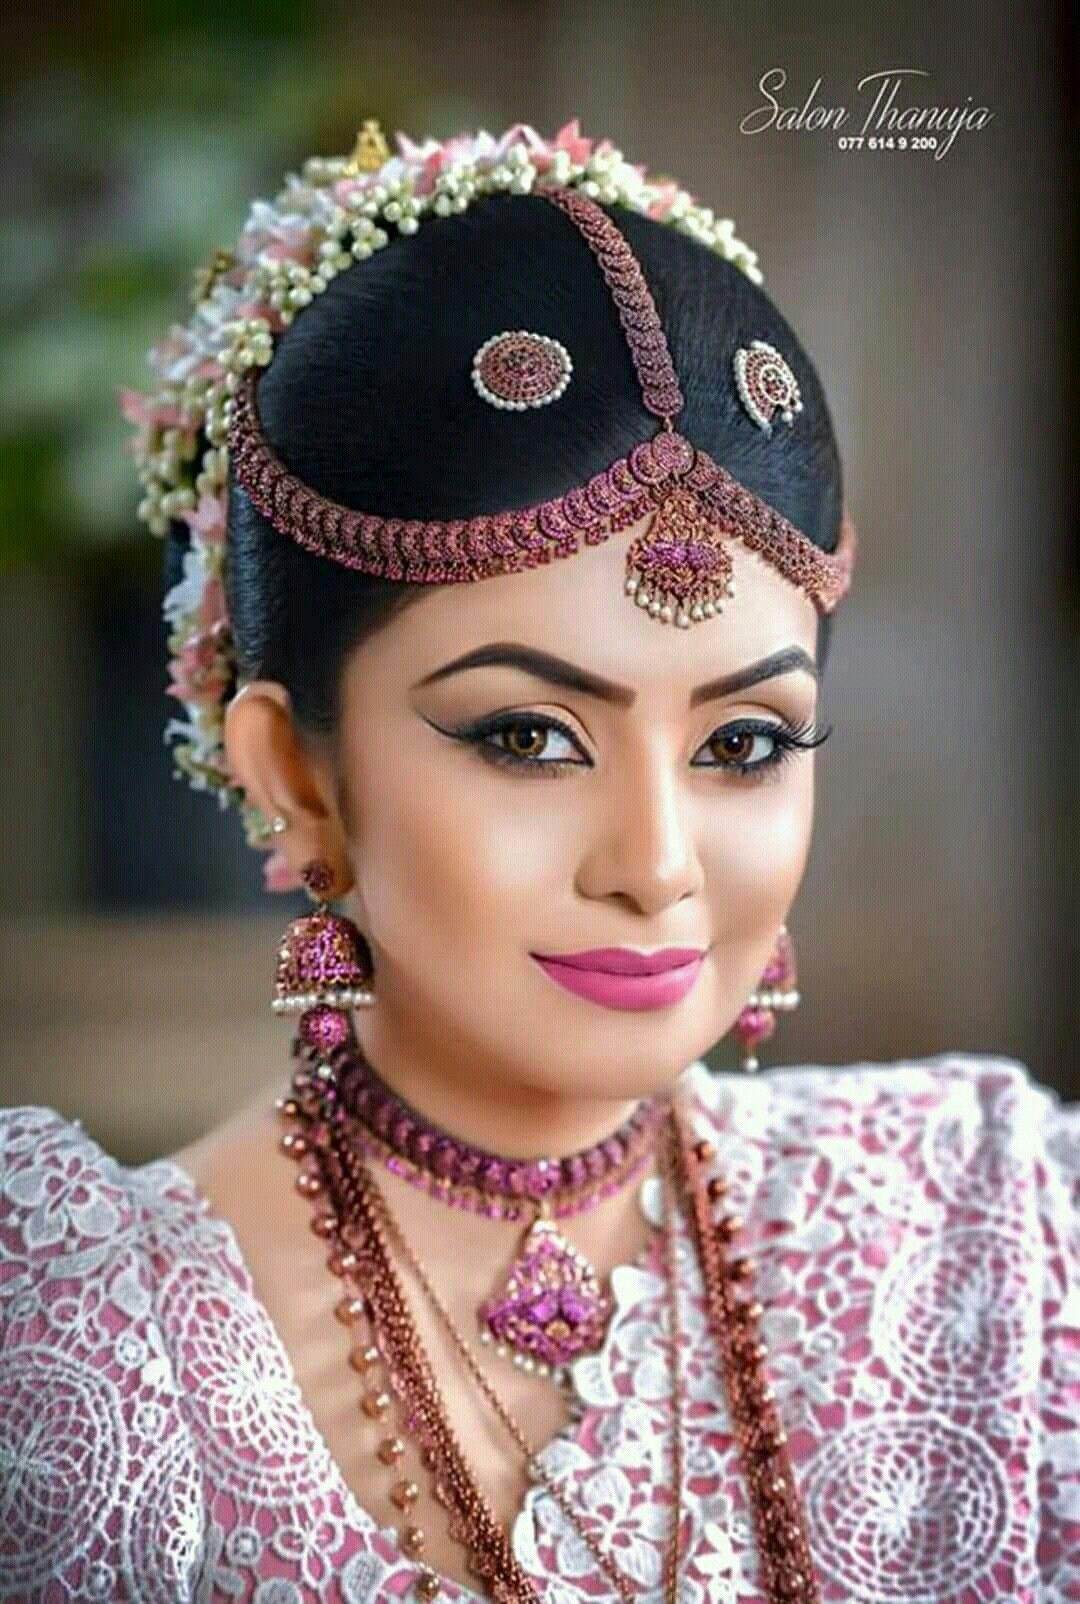 dressed by thanuja dananjaya | bride | white saree wedding